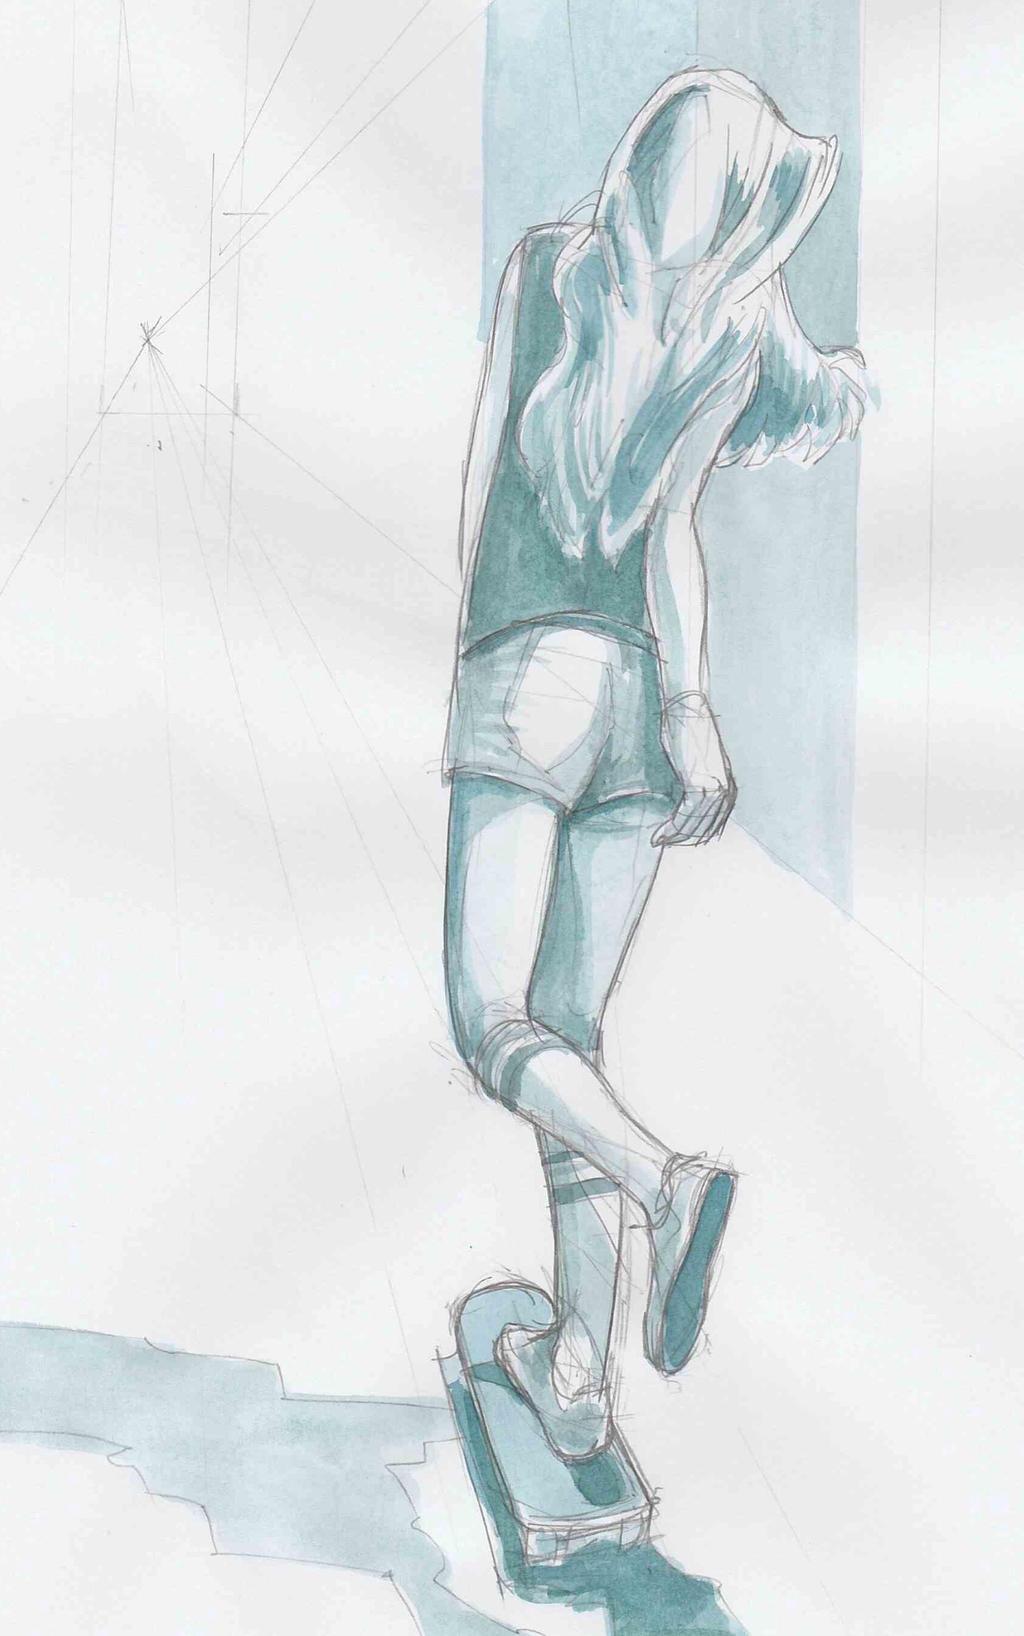 Watercolour skateboarder by JeremyWDunn